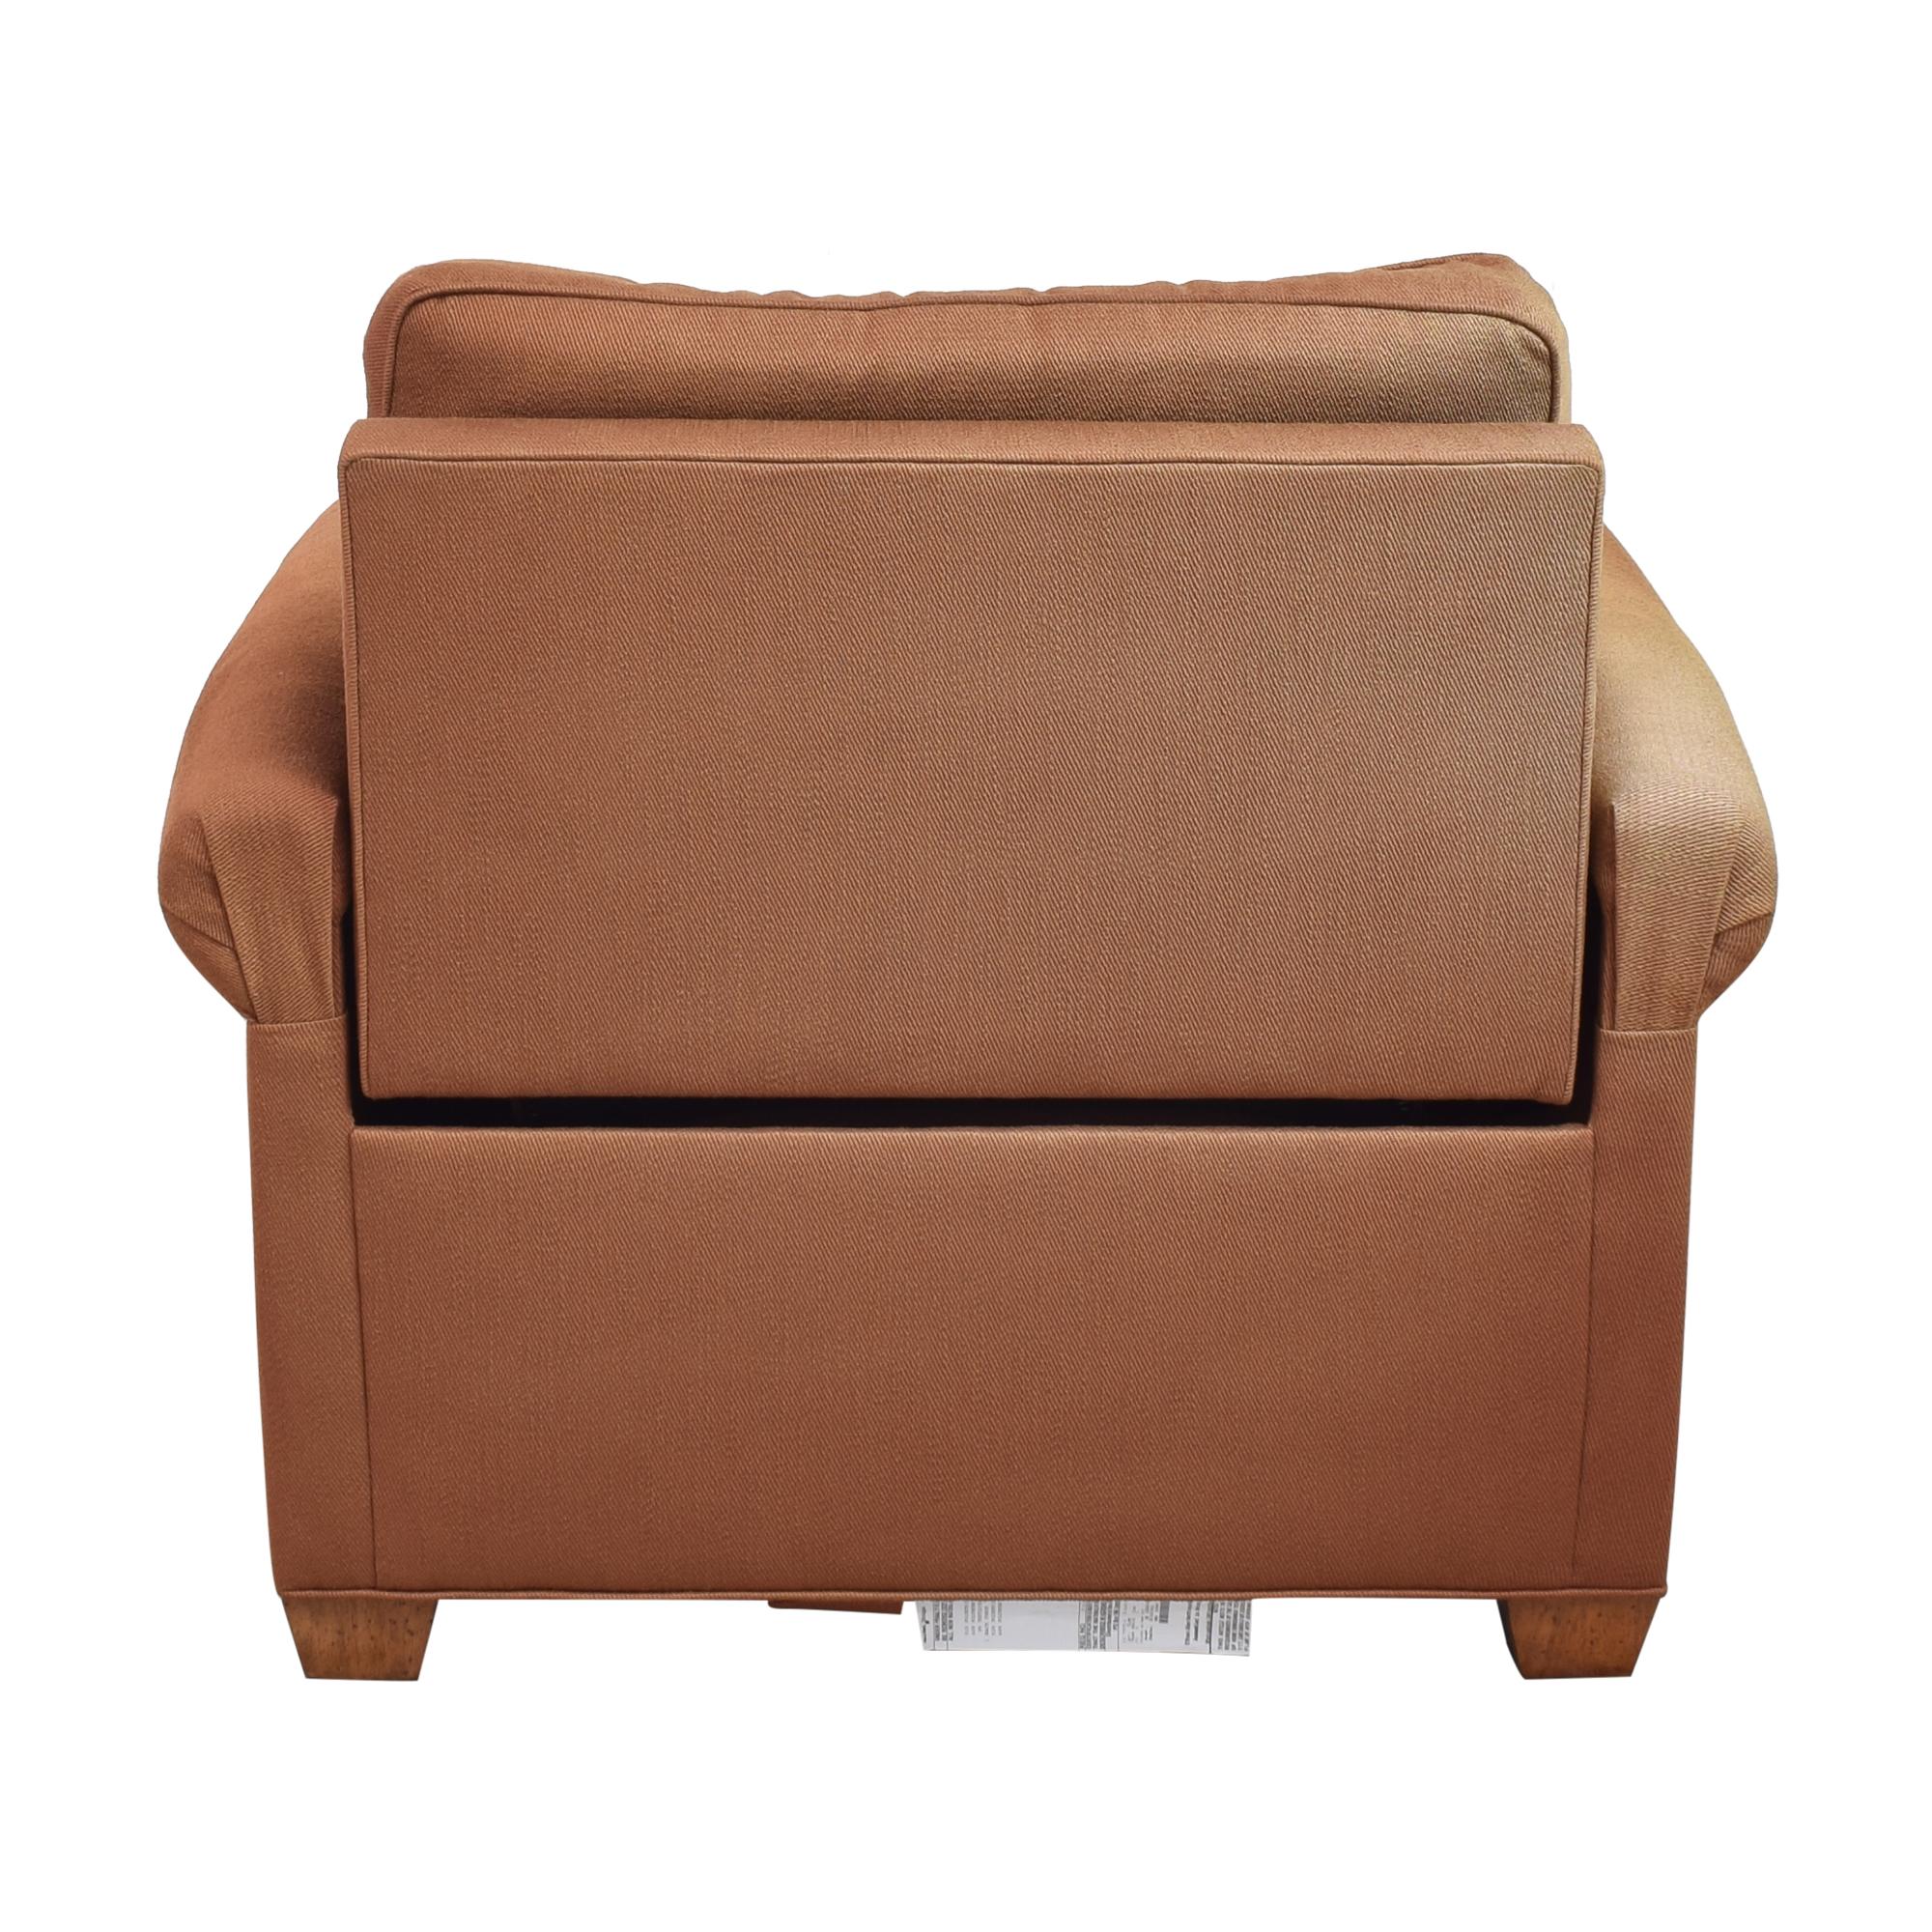 shop Ethan Allen Conor Recliner Ethan Allen Chairs